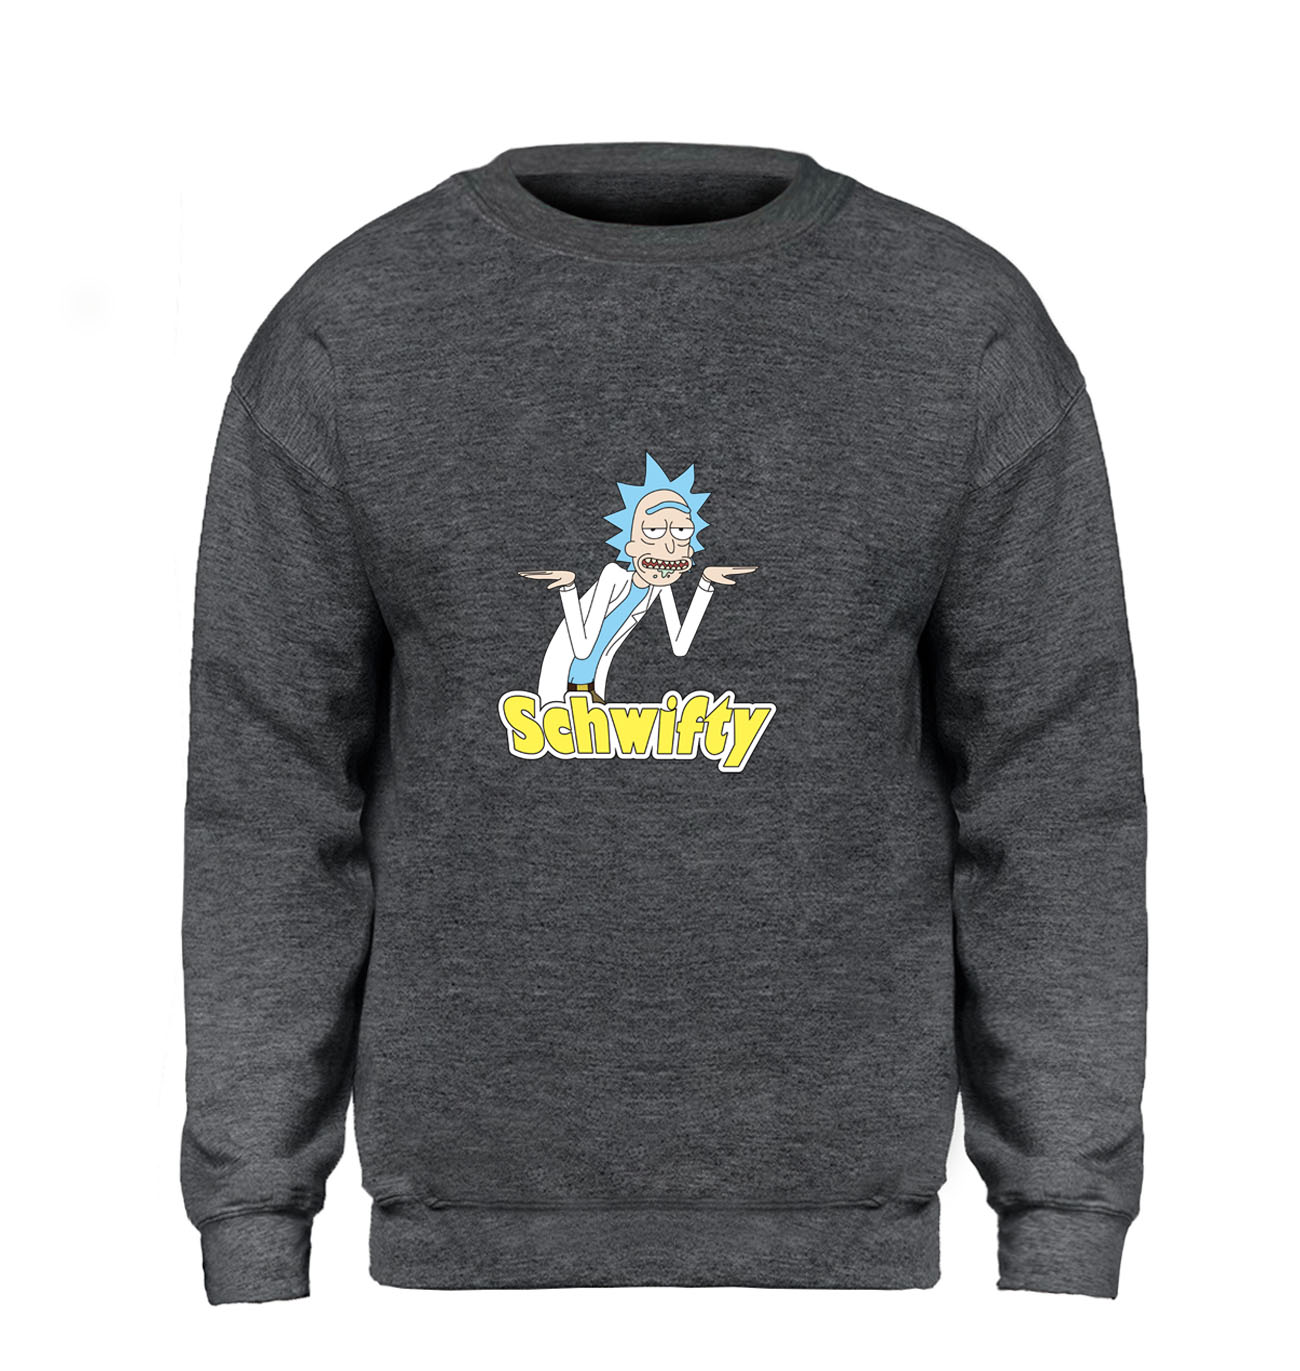 Rick and Morty Hoodie Men Schwifty Sweatshirt Funny Slim Crewneck Sweatshirts Winter Autumn Fleece Warm Harajuku Hoodies Mens